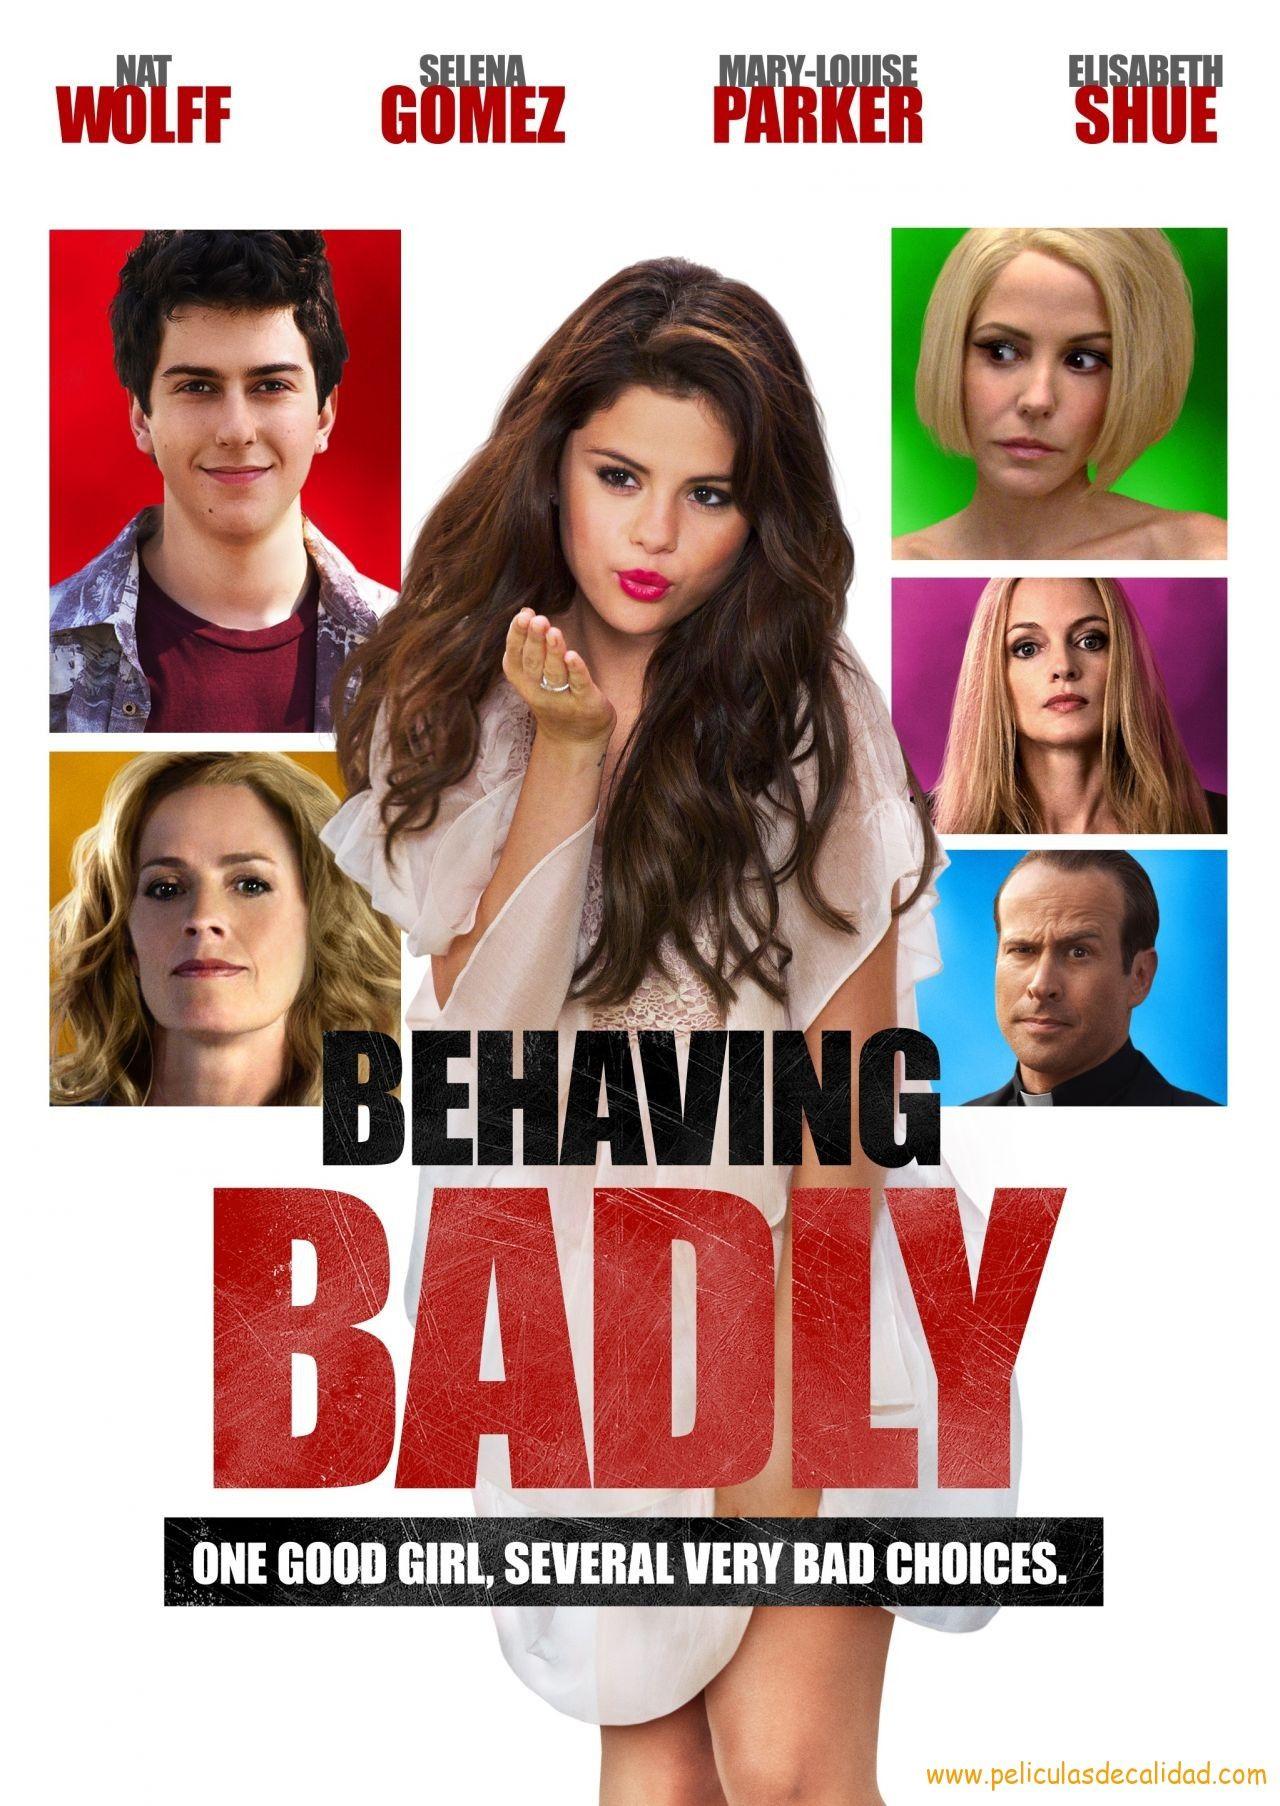 Related Image Selena Gomez Movies Selena Gomez Comedy Movies